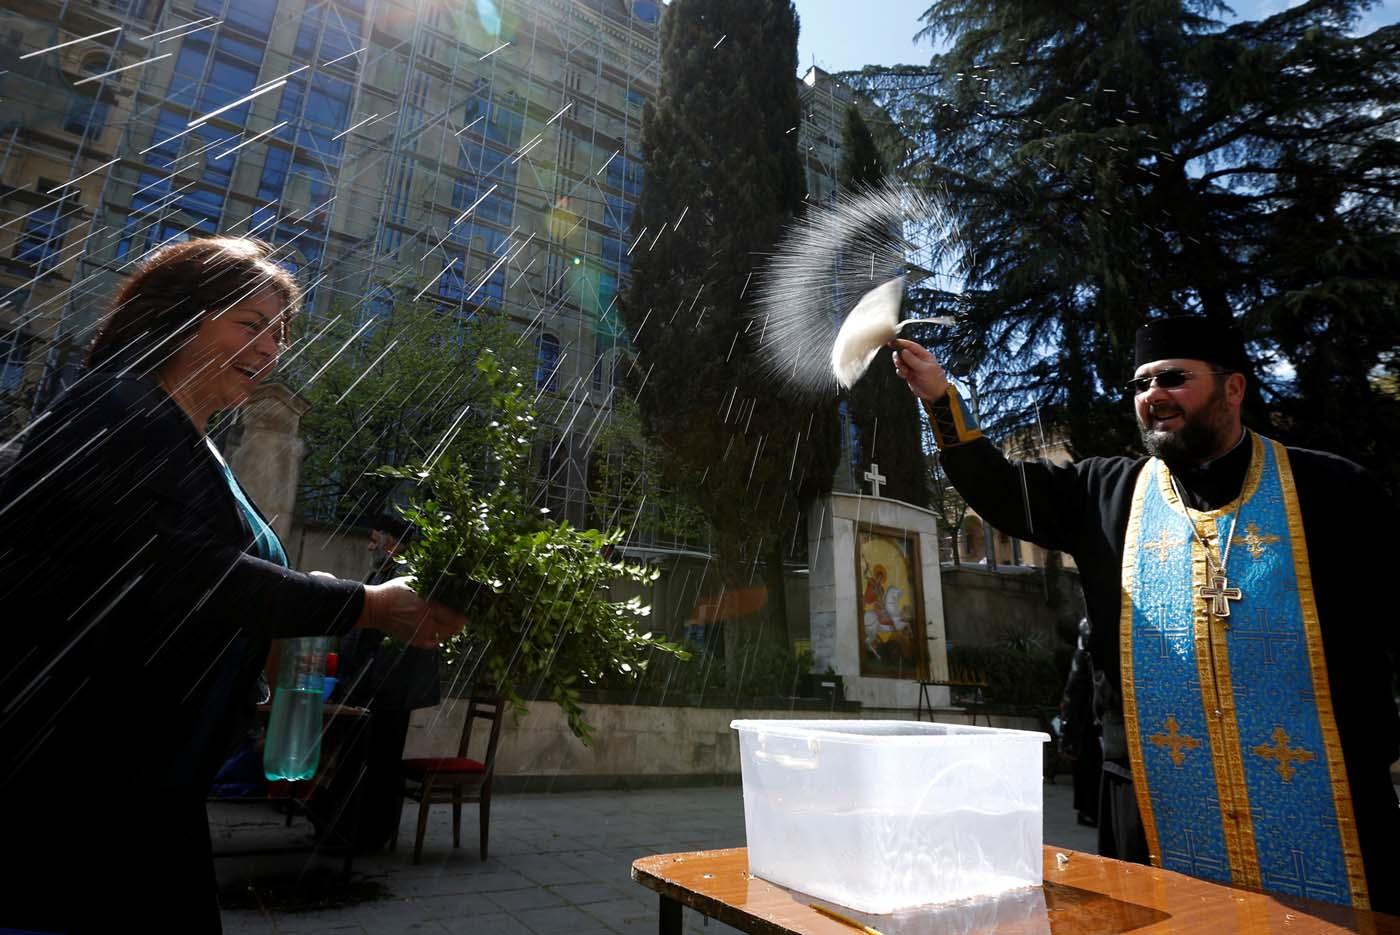 A priest sprays holy water during the Palm Sunday service in Tbilisi, Georgia April 9, 2017. REUTERS/David Mdzinarishvili